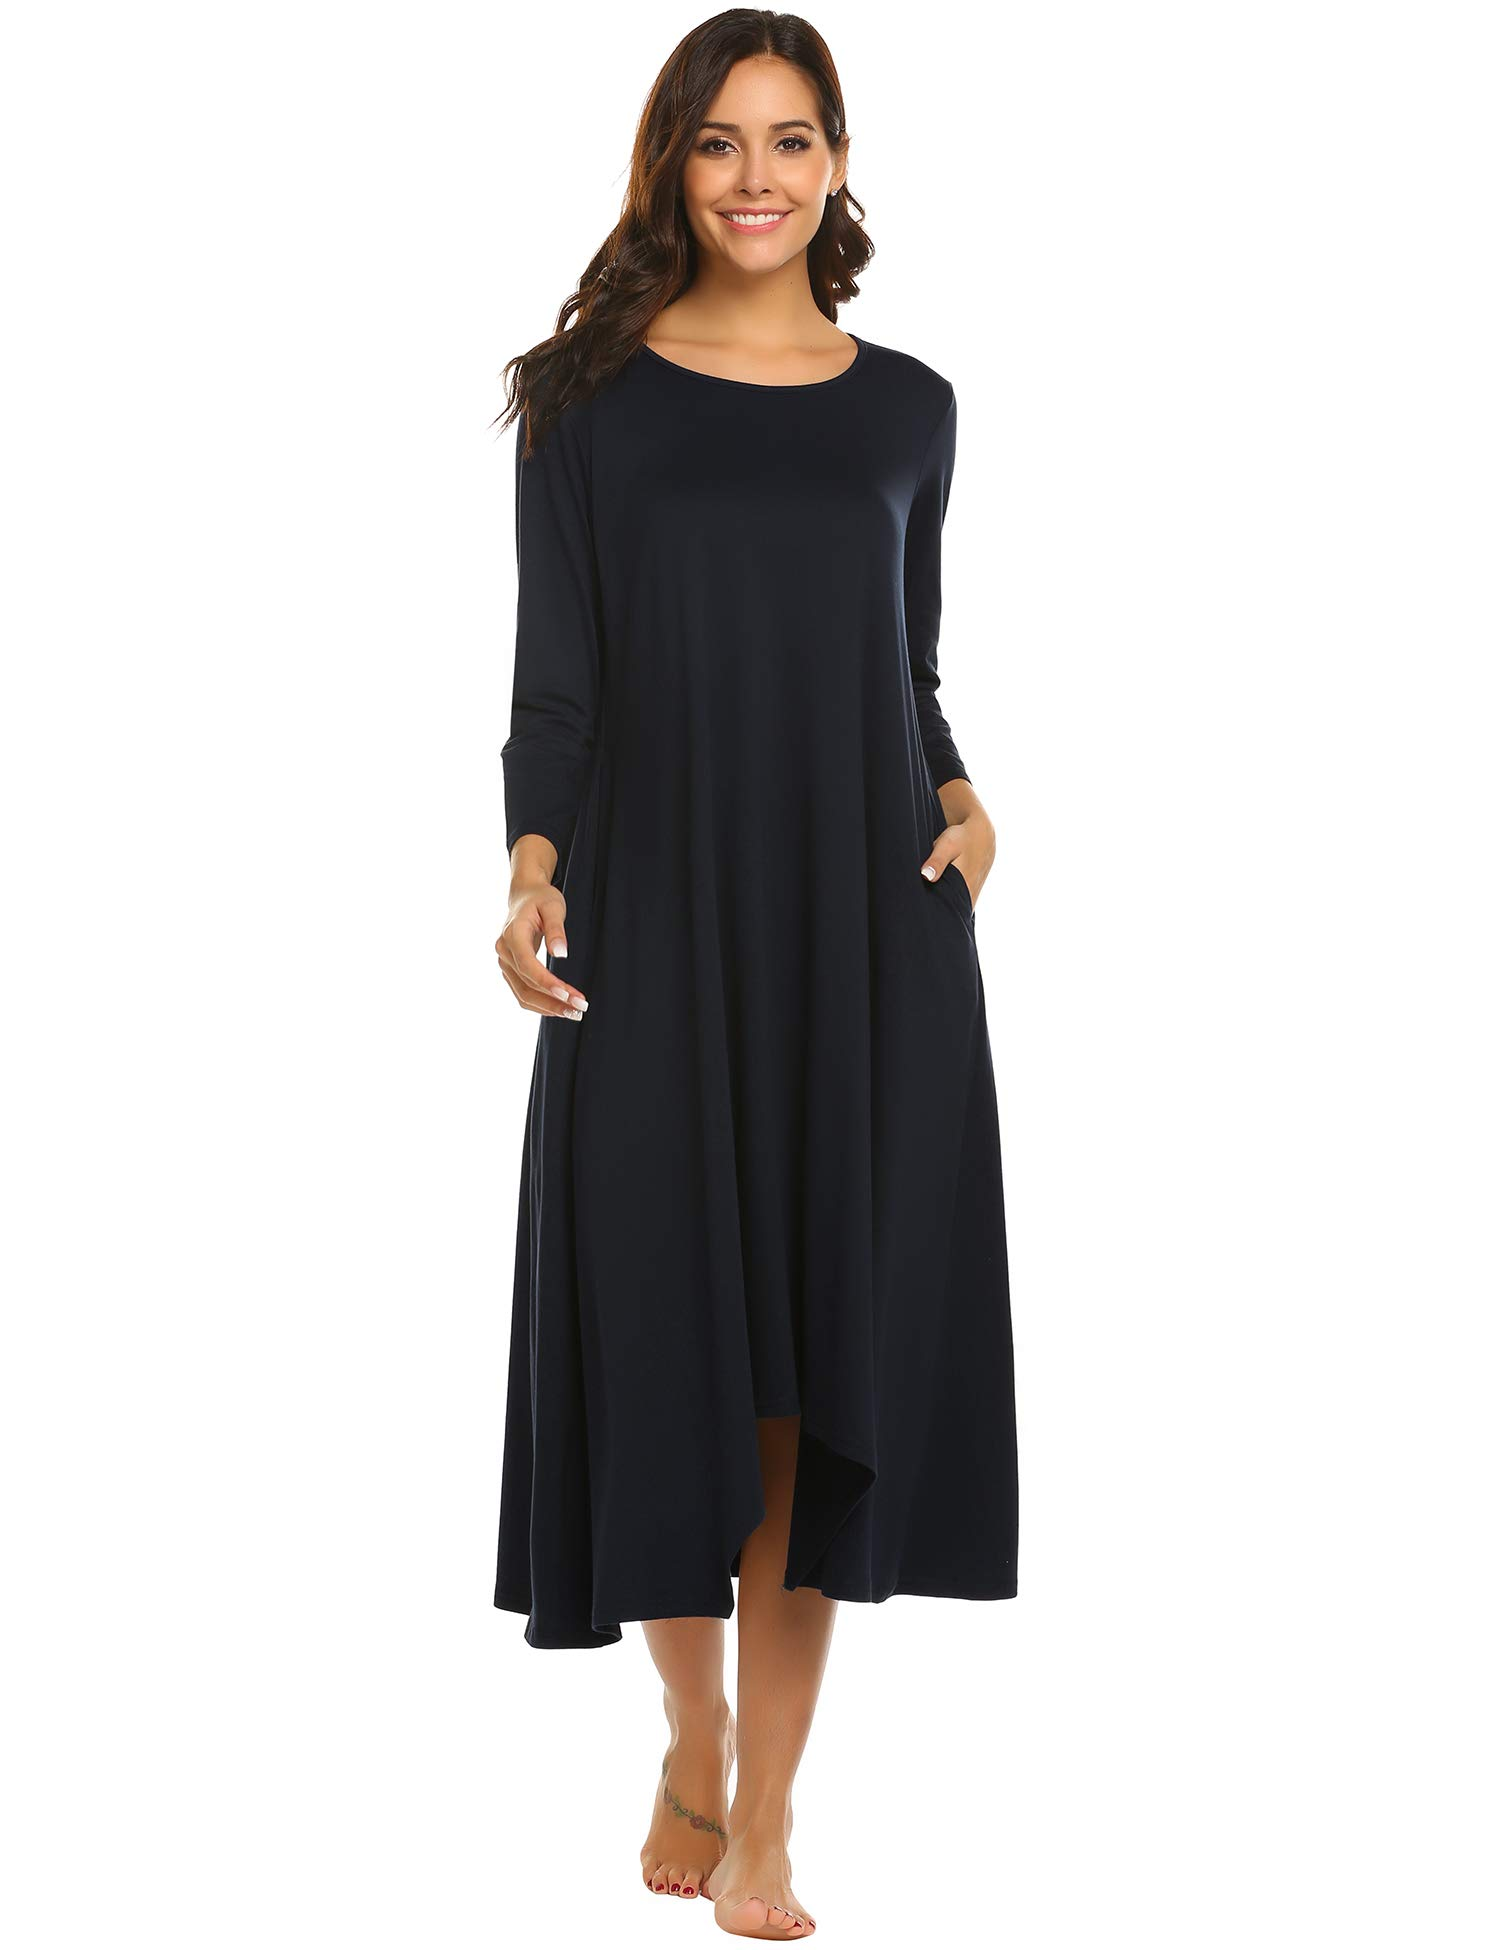 Ekouaer Short Sleeve Nightgown Sleep wear Night Shirt Sleep Dress for Women c212fc4b7